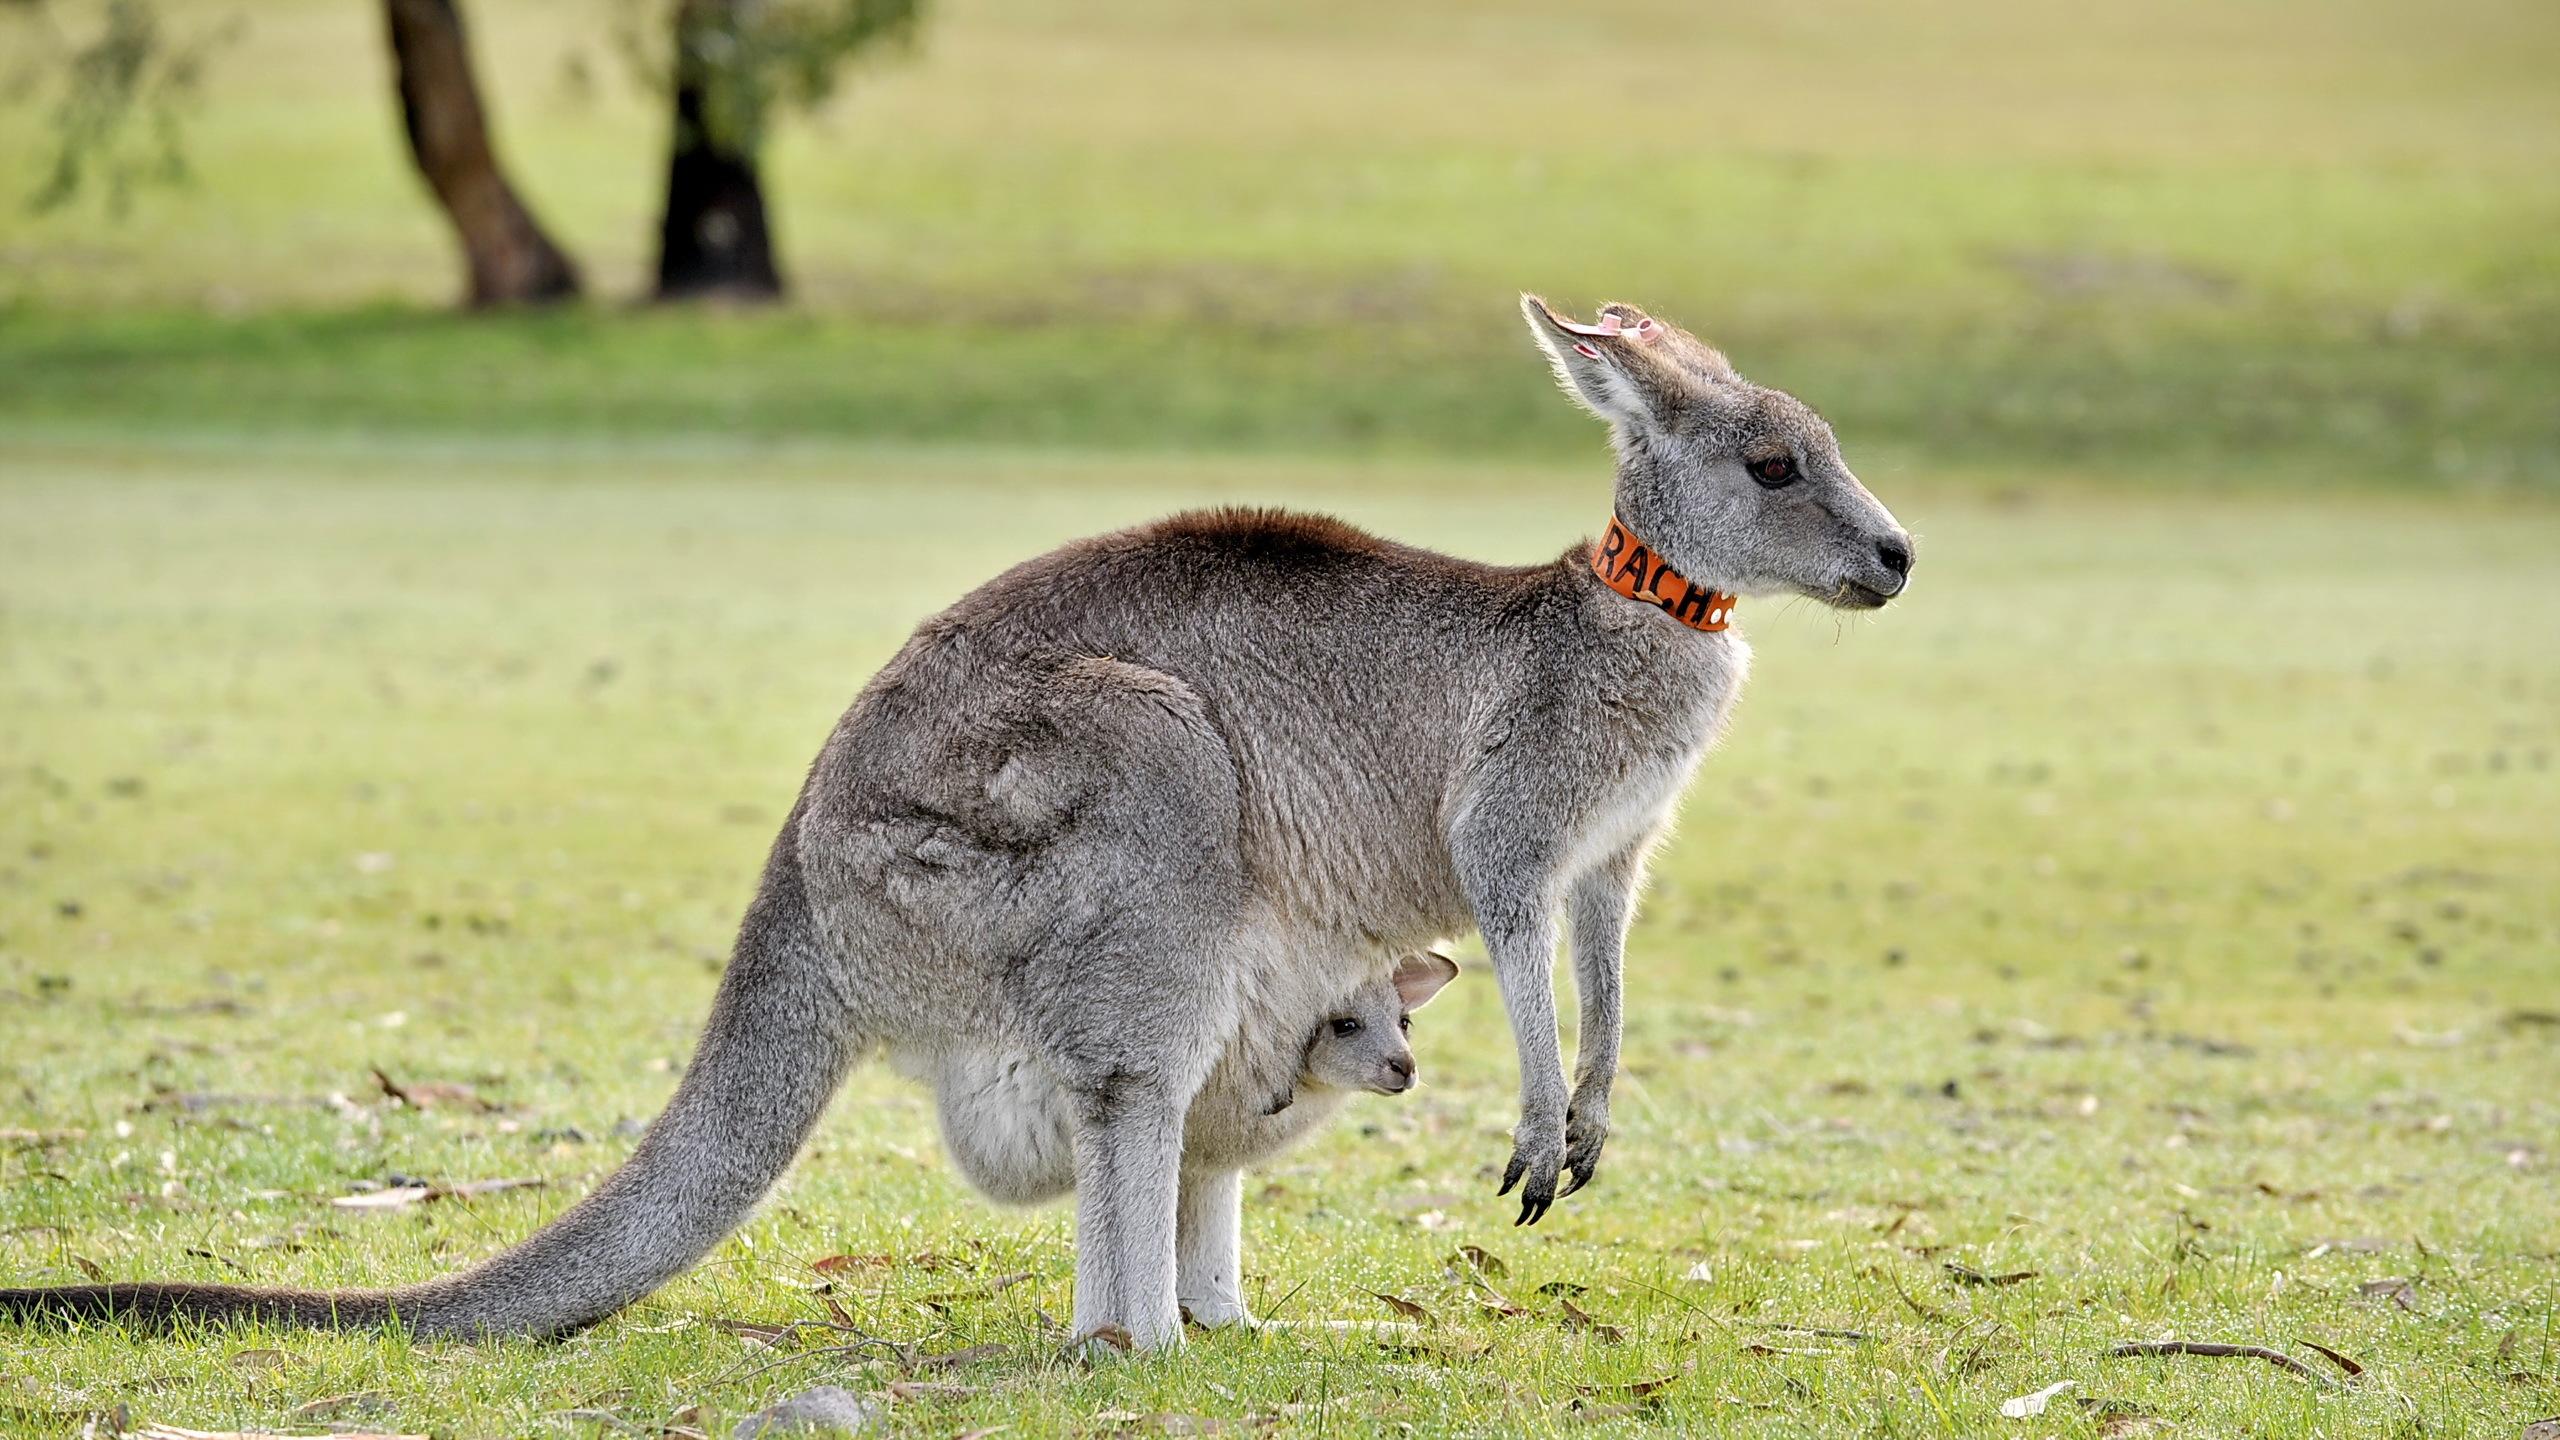 Kanguru pictures